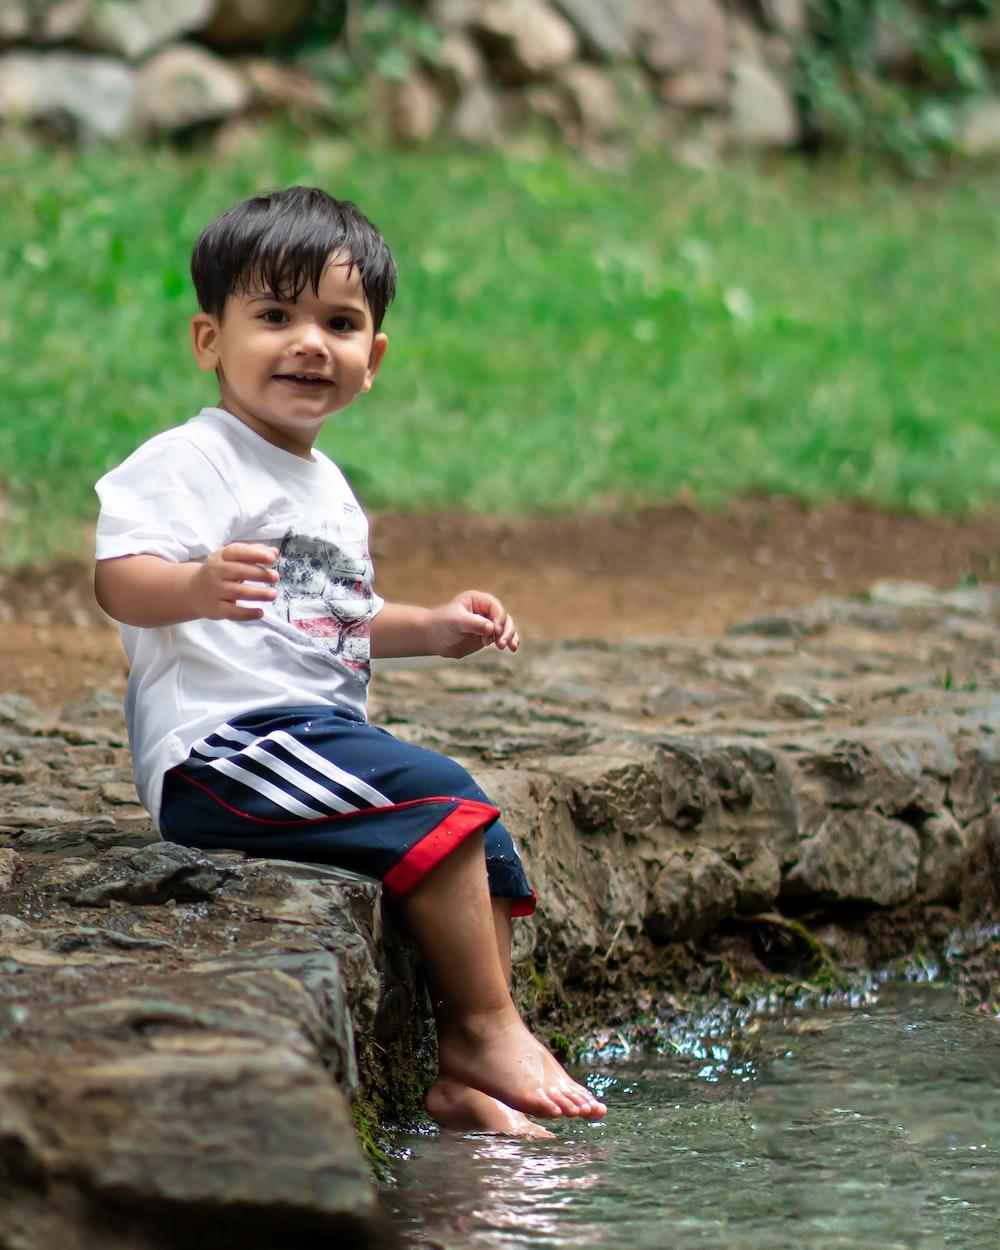 boy sitting by rock by body of water